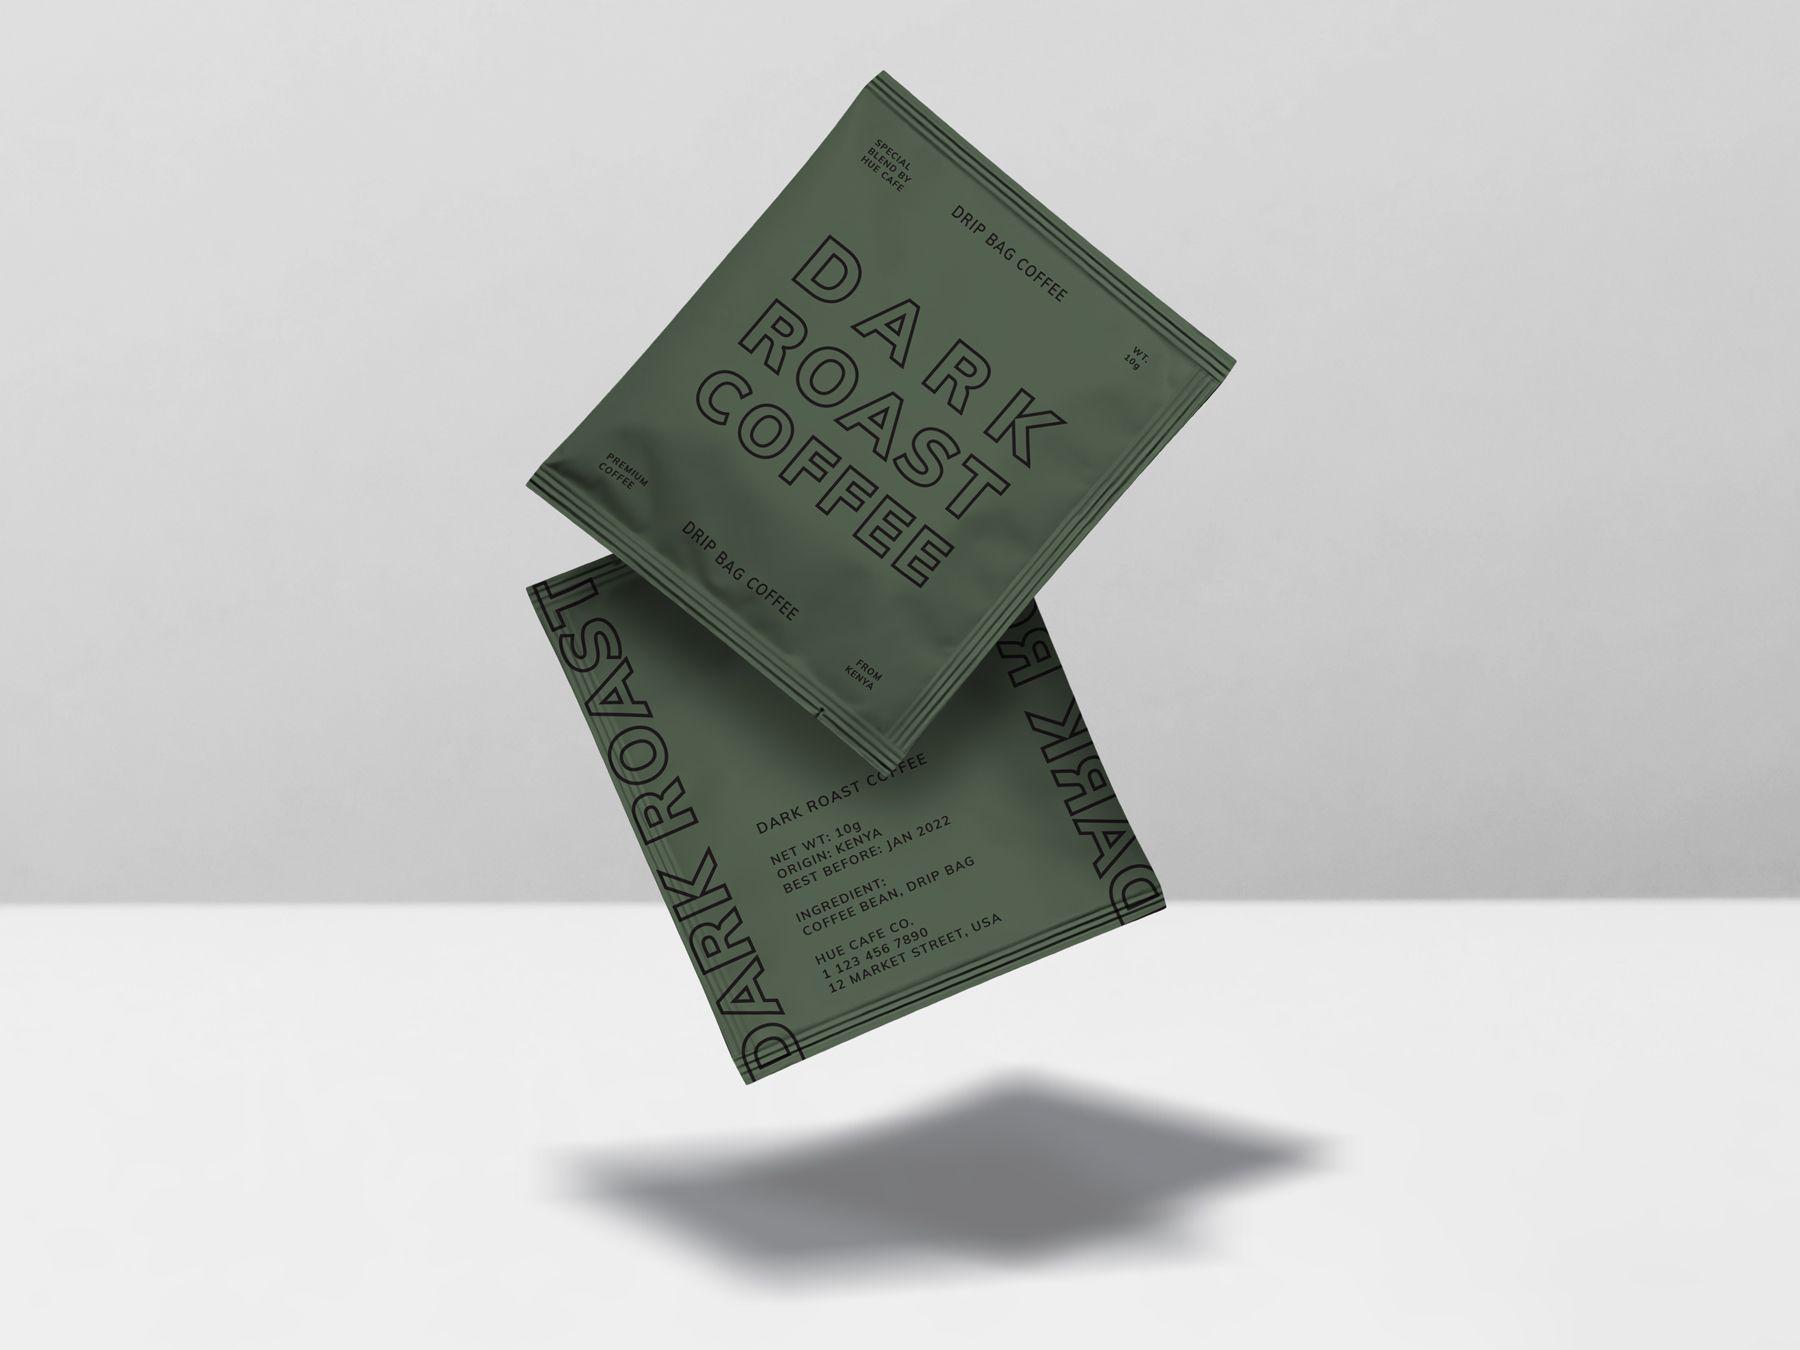 Download Chai Tea Bag Sealed Bag Mockup Bag Mockup Coffee Bag Design Mockup